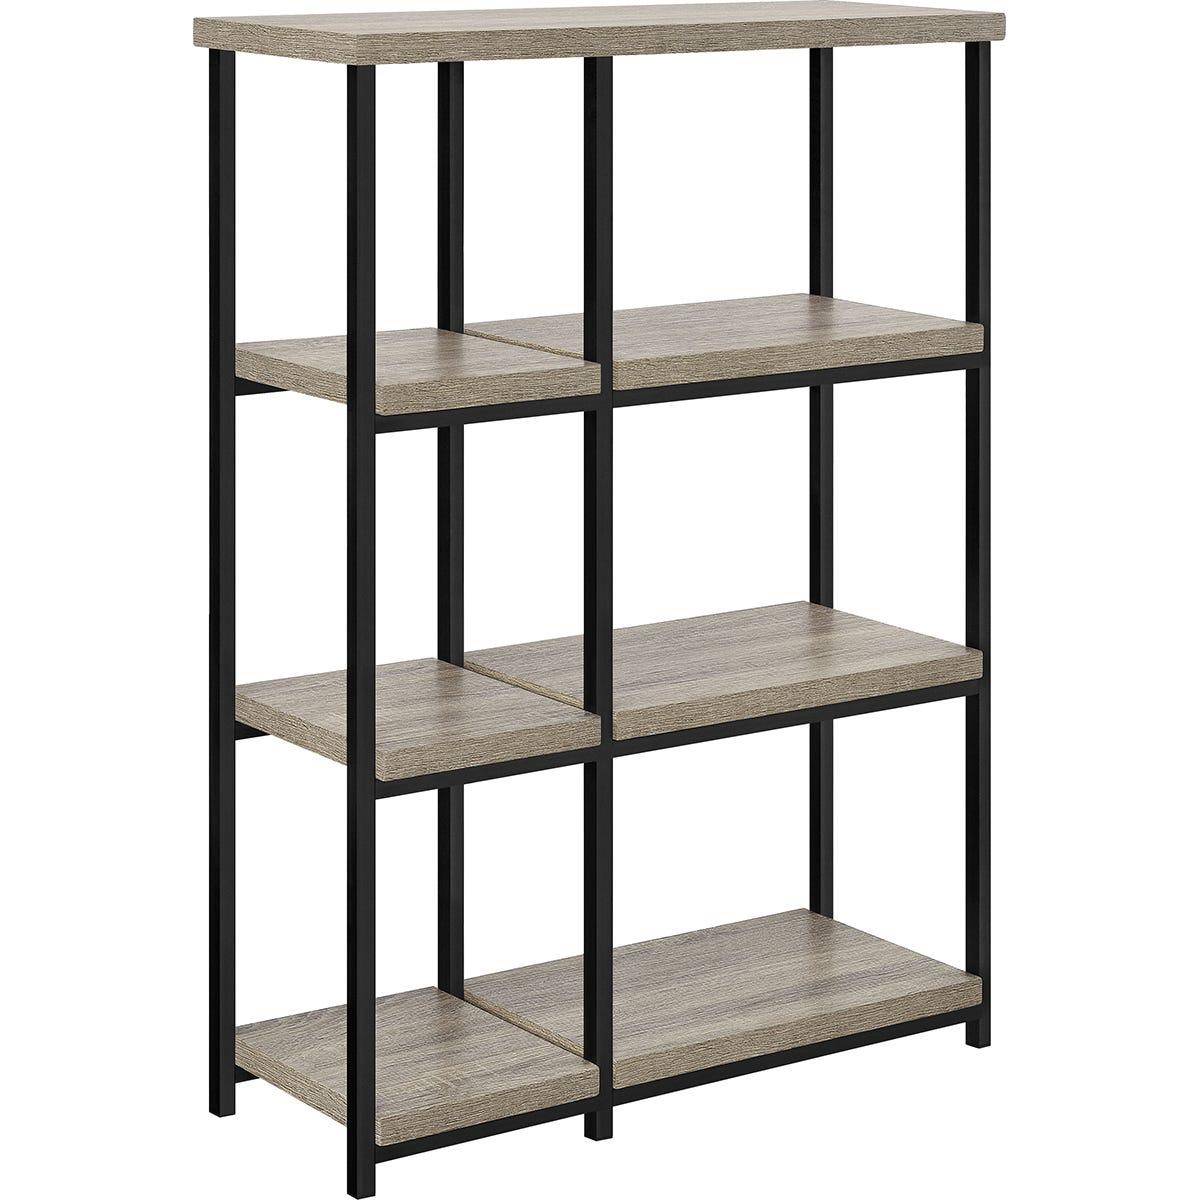 Dorel Elmwood Bookcase - Grey Oak